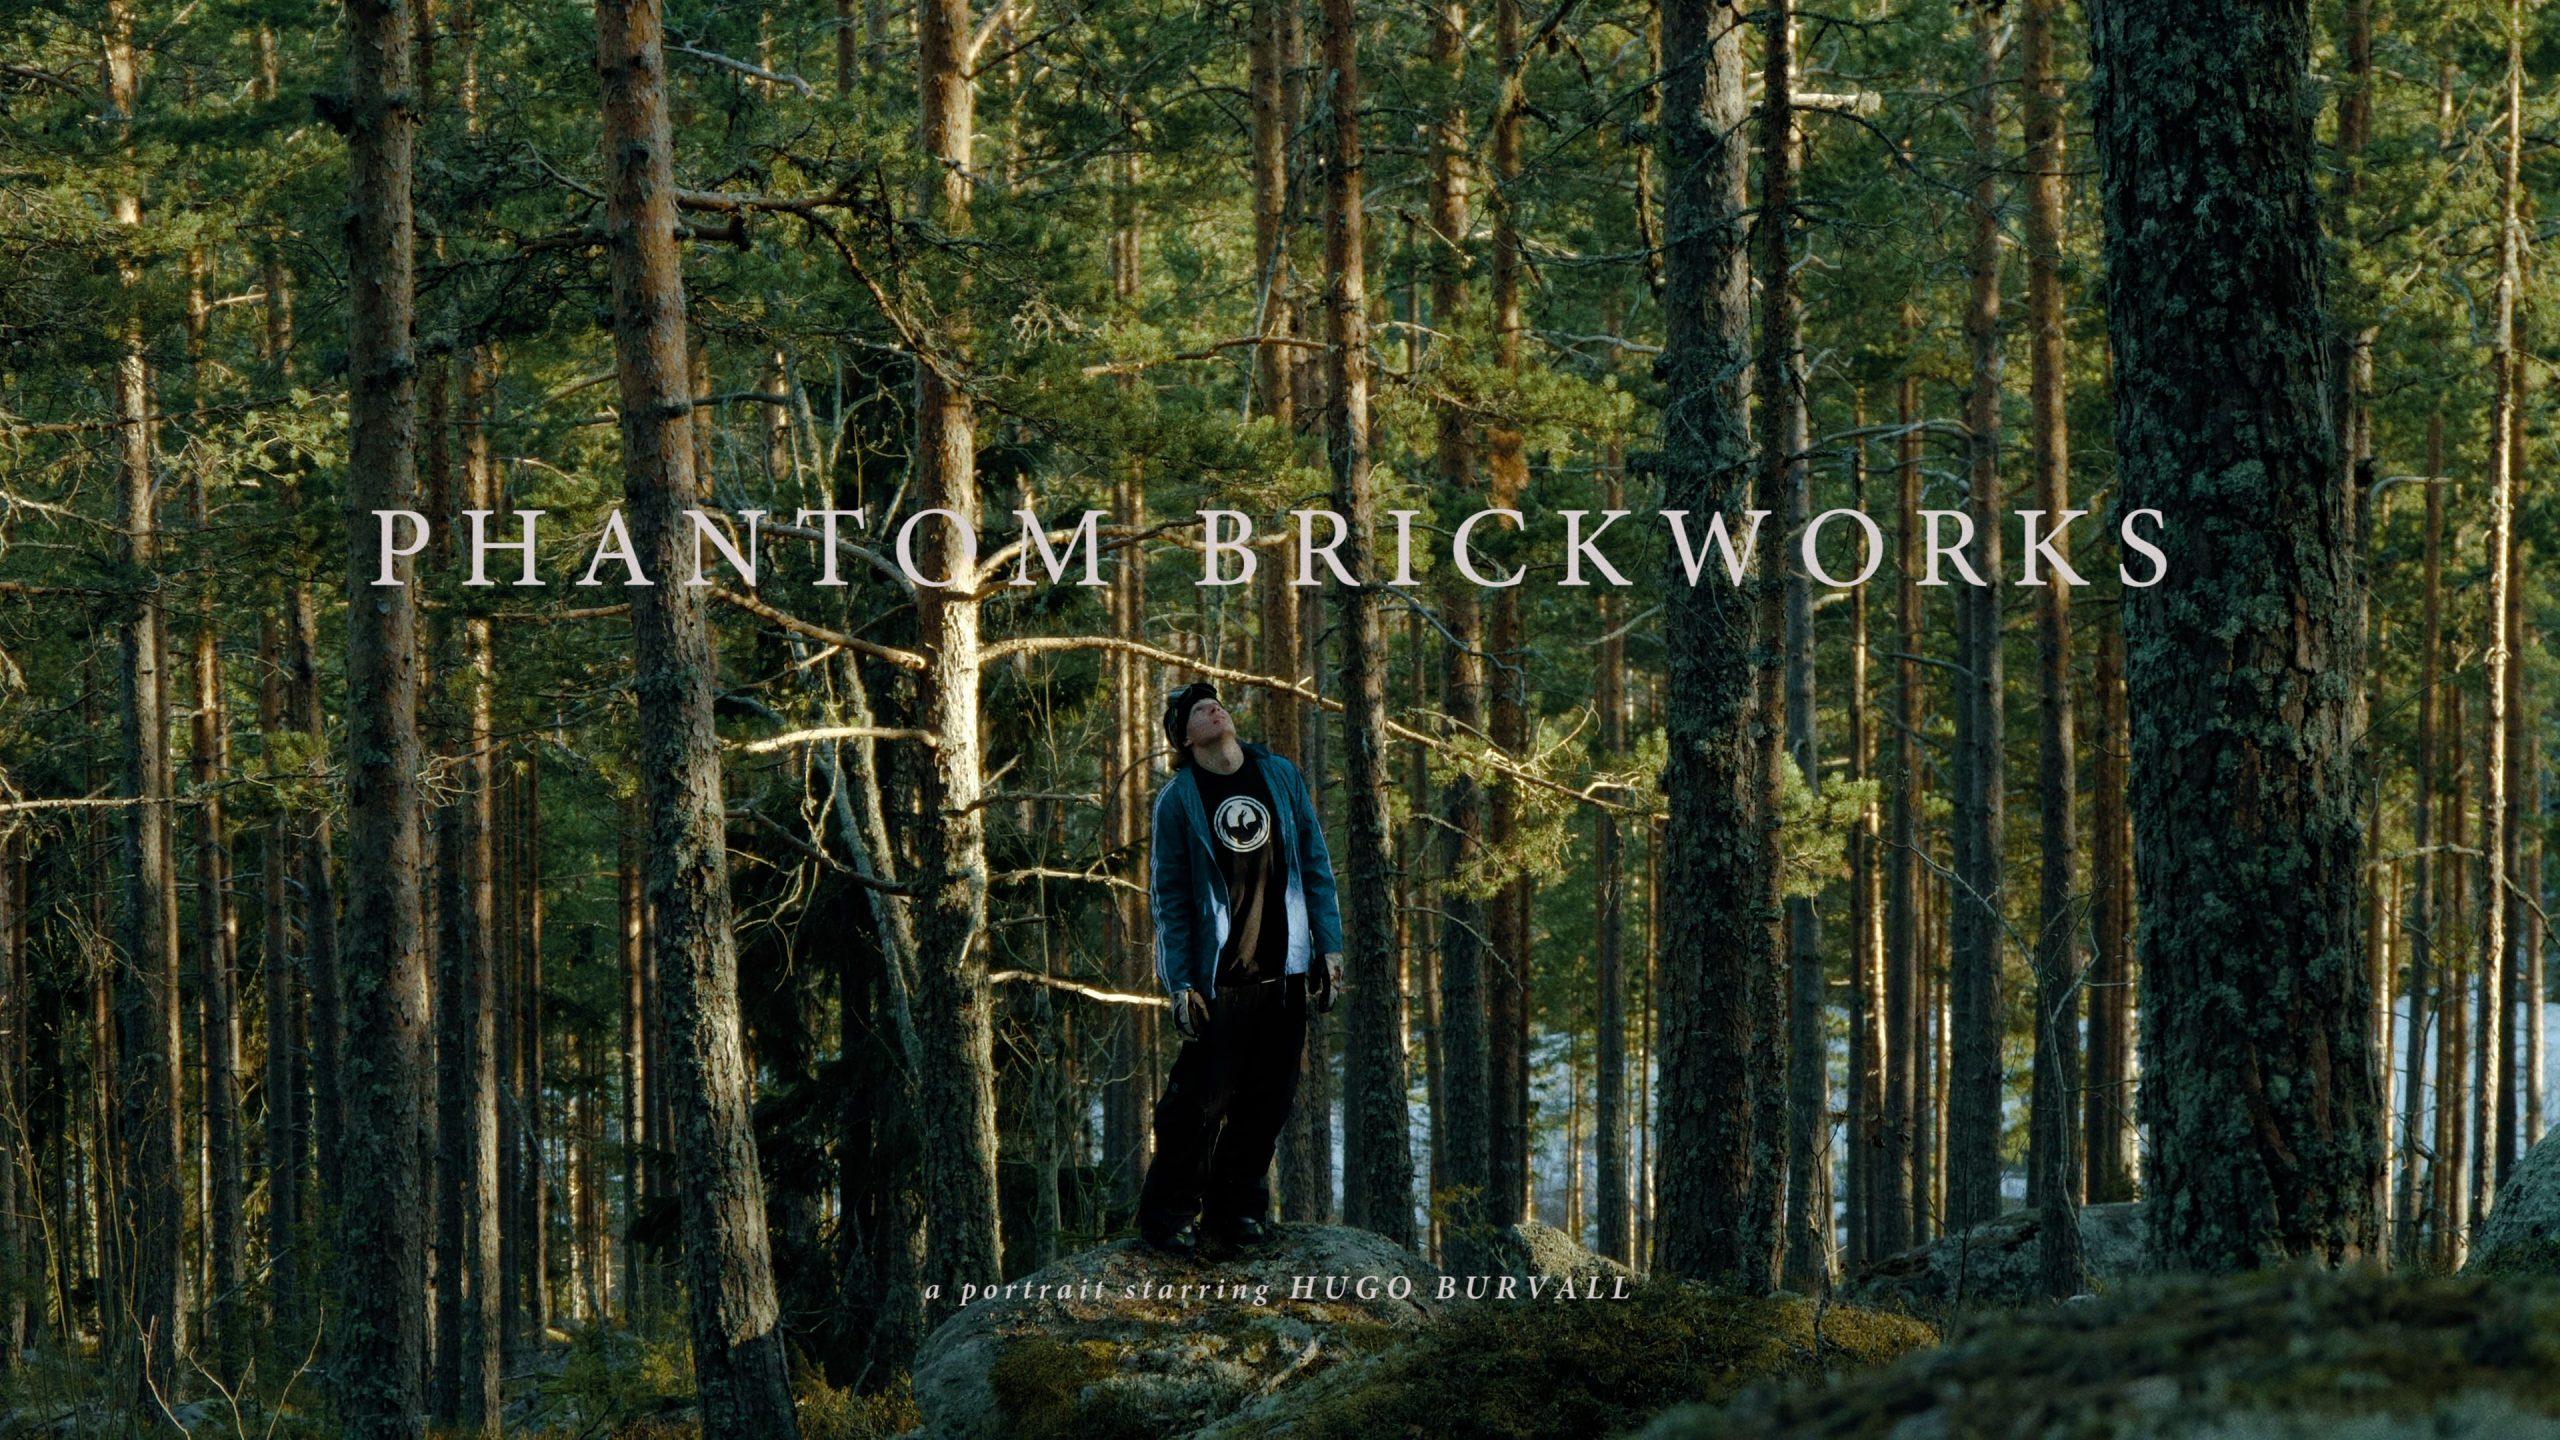 """Phantom Brickworks"" – A portrait starring Hugo Burvall (2019)"